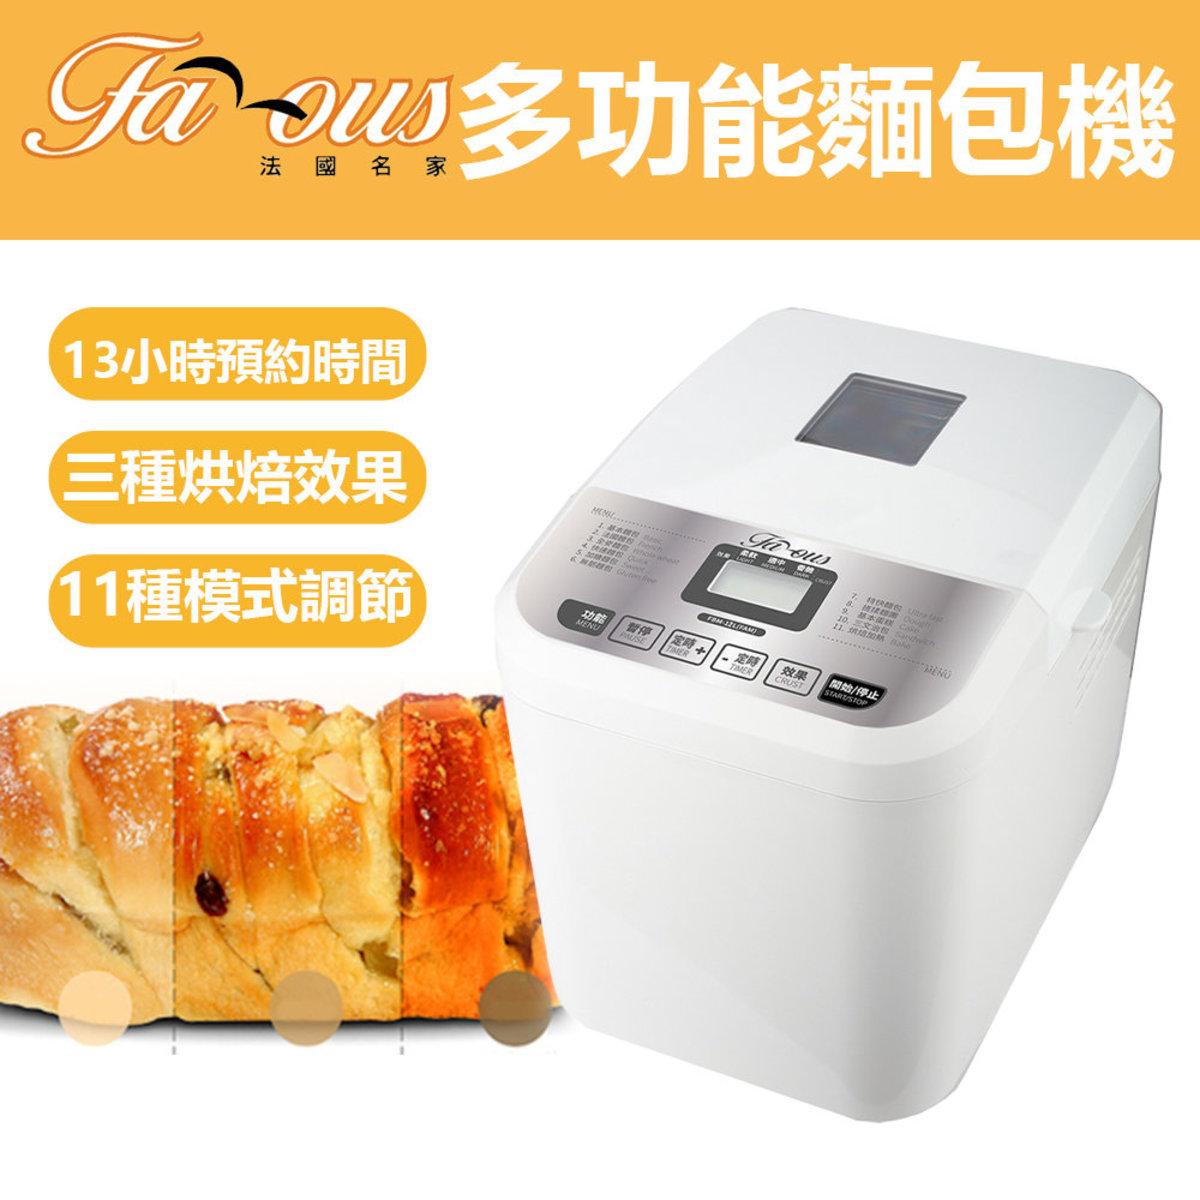 Bread Maker FBM-12L (2020 New version)